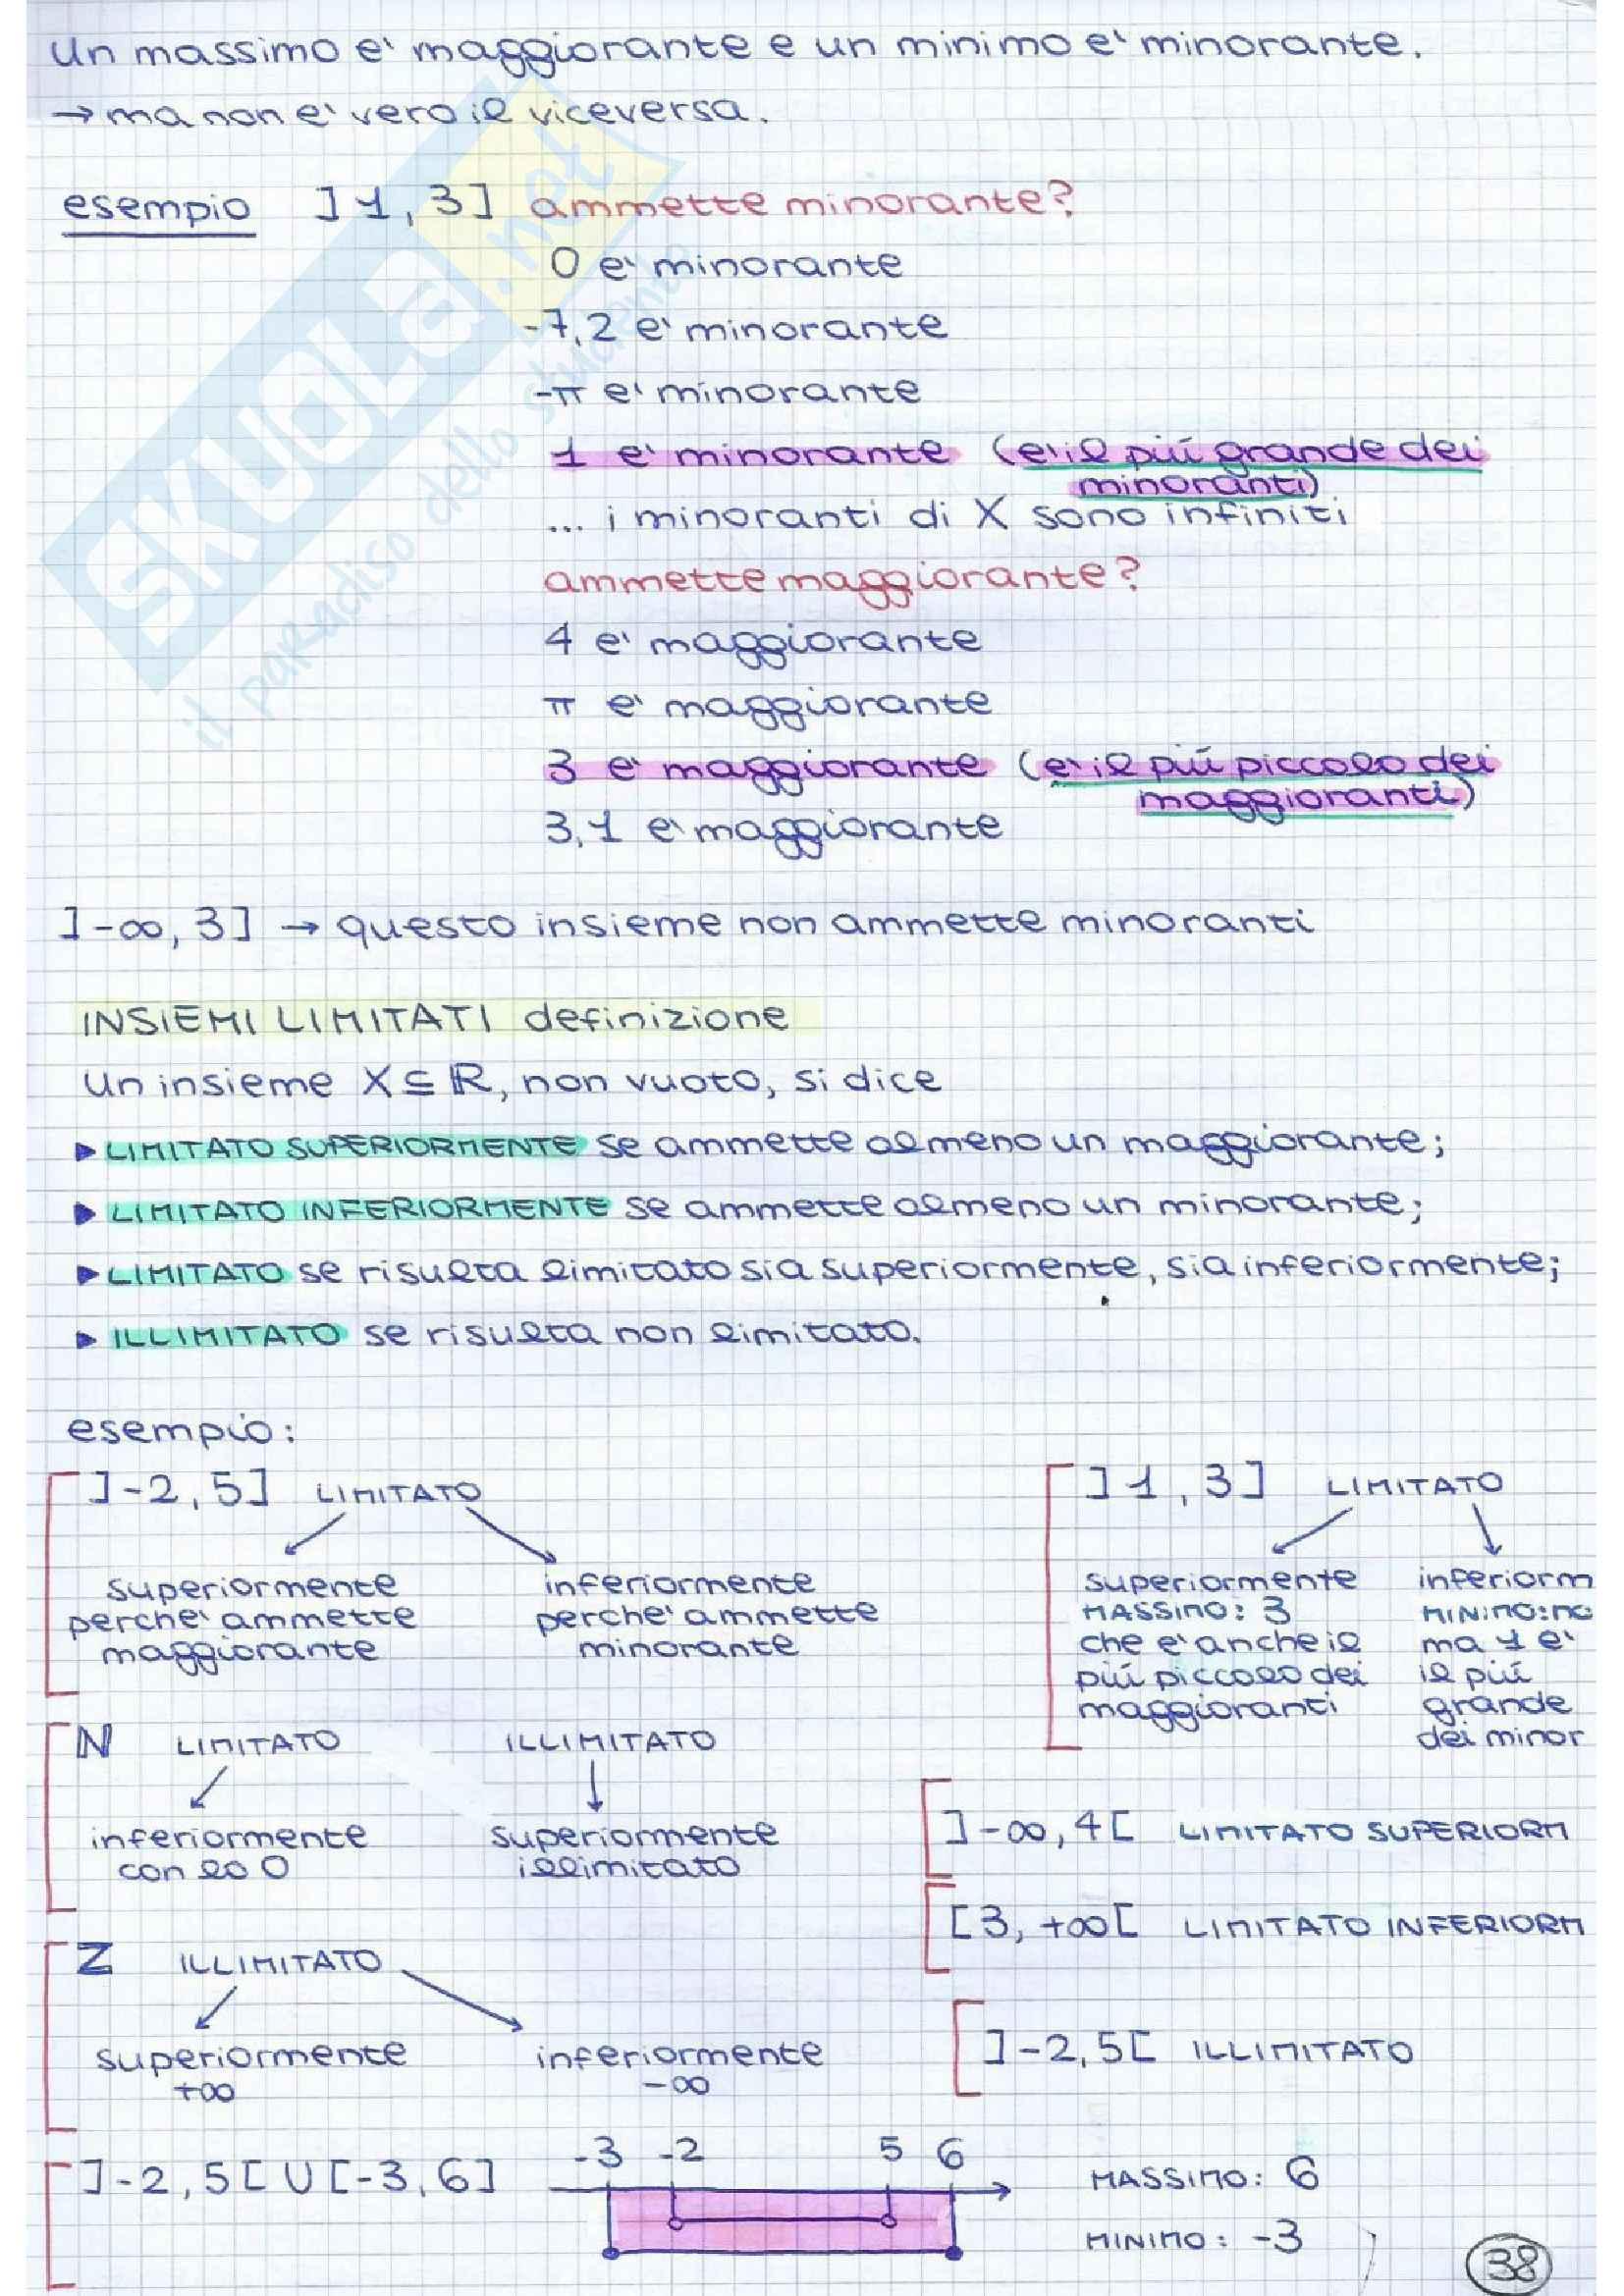 Metodi matematici I - teoria e pratica 1° parziale Pag. 36